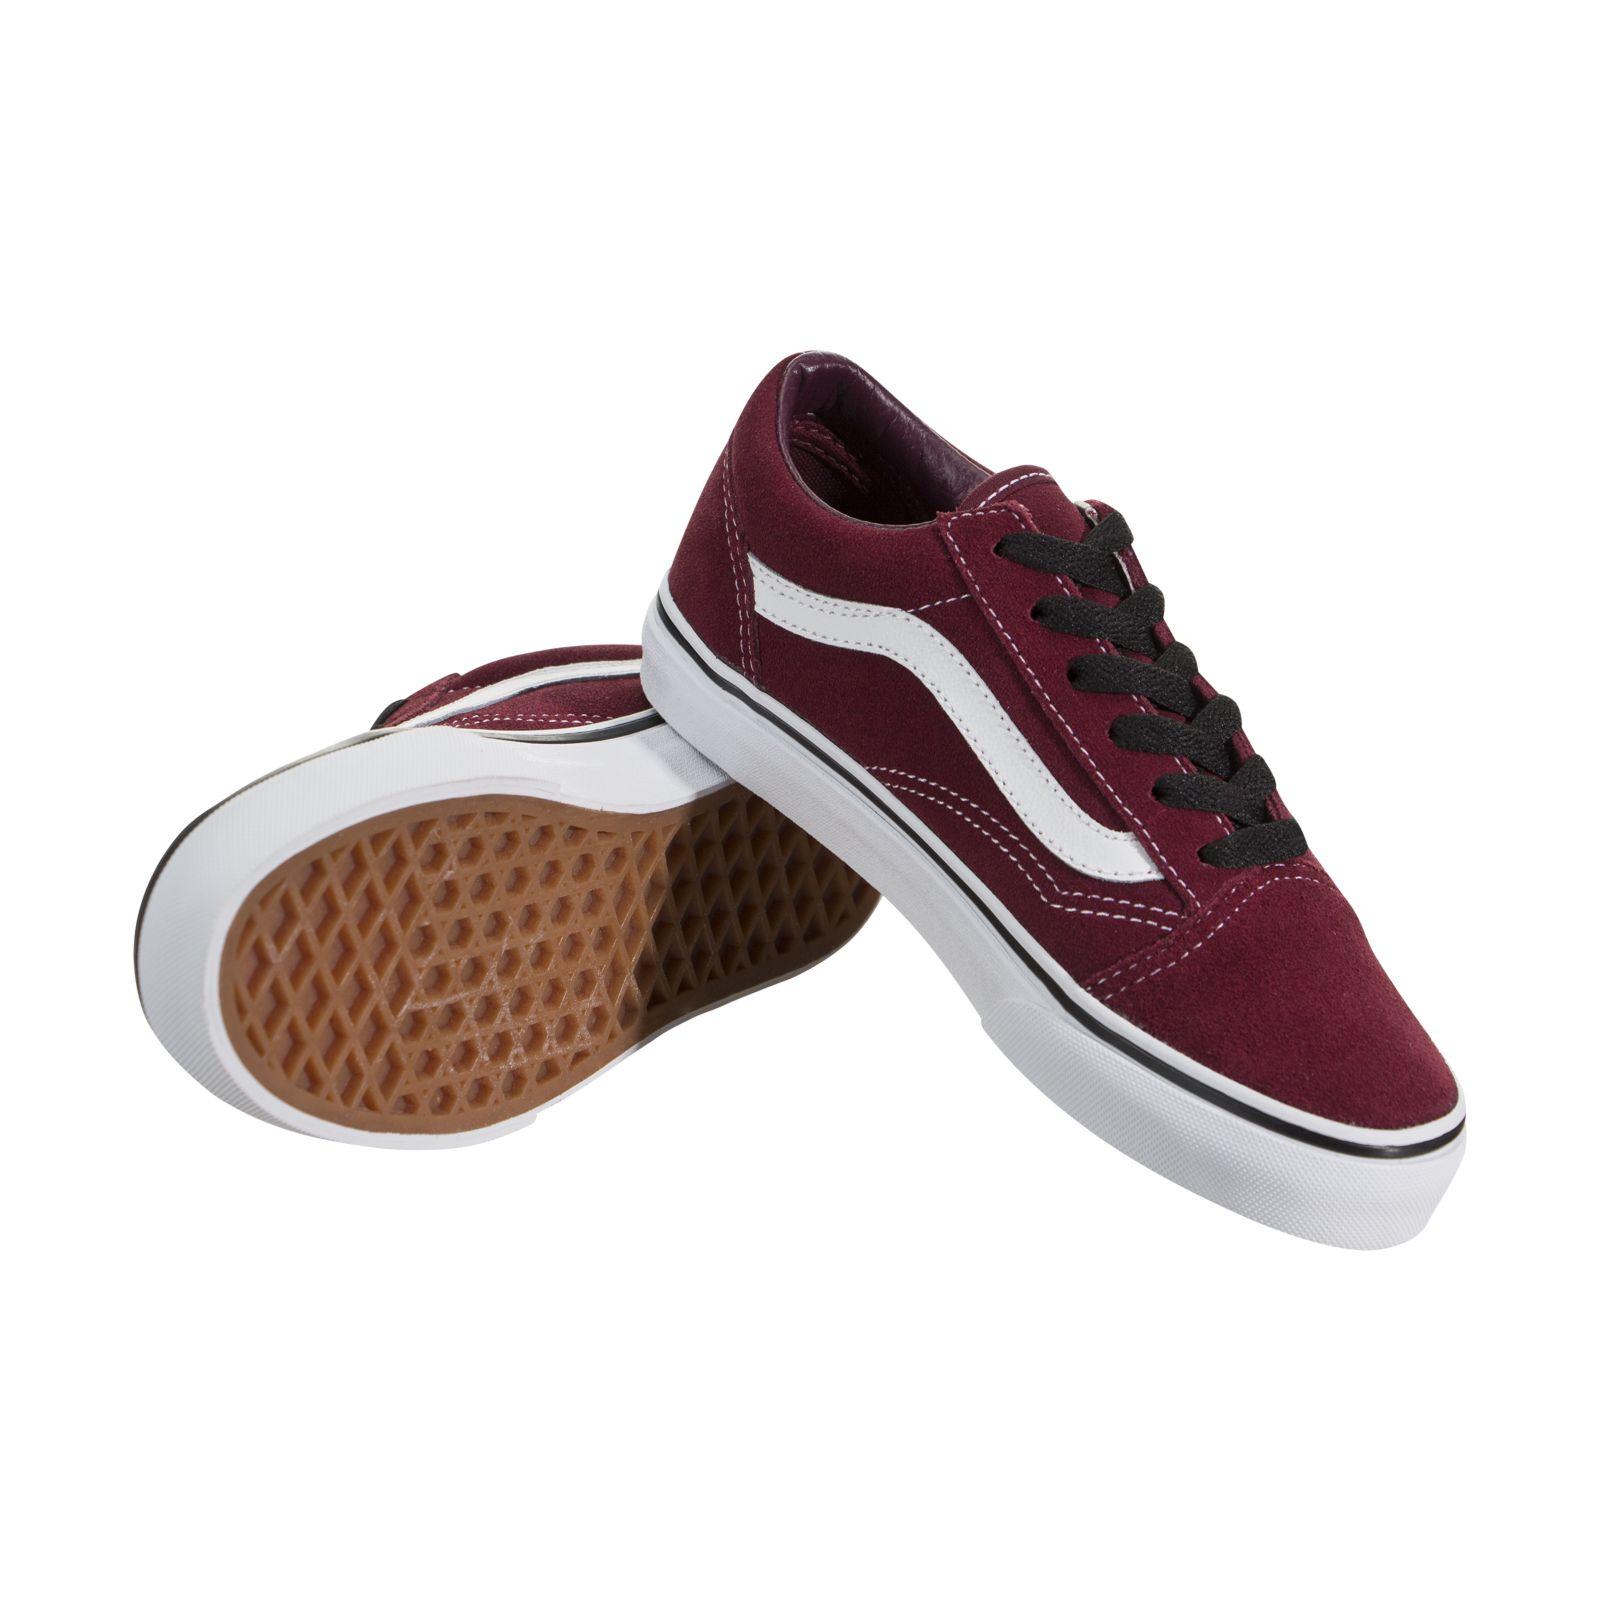 premium selection c2298 e2124 Vans-Old-Skool-Preschool-vn0a38hb6e0 thumbnail 3